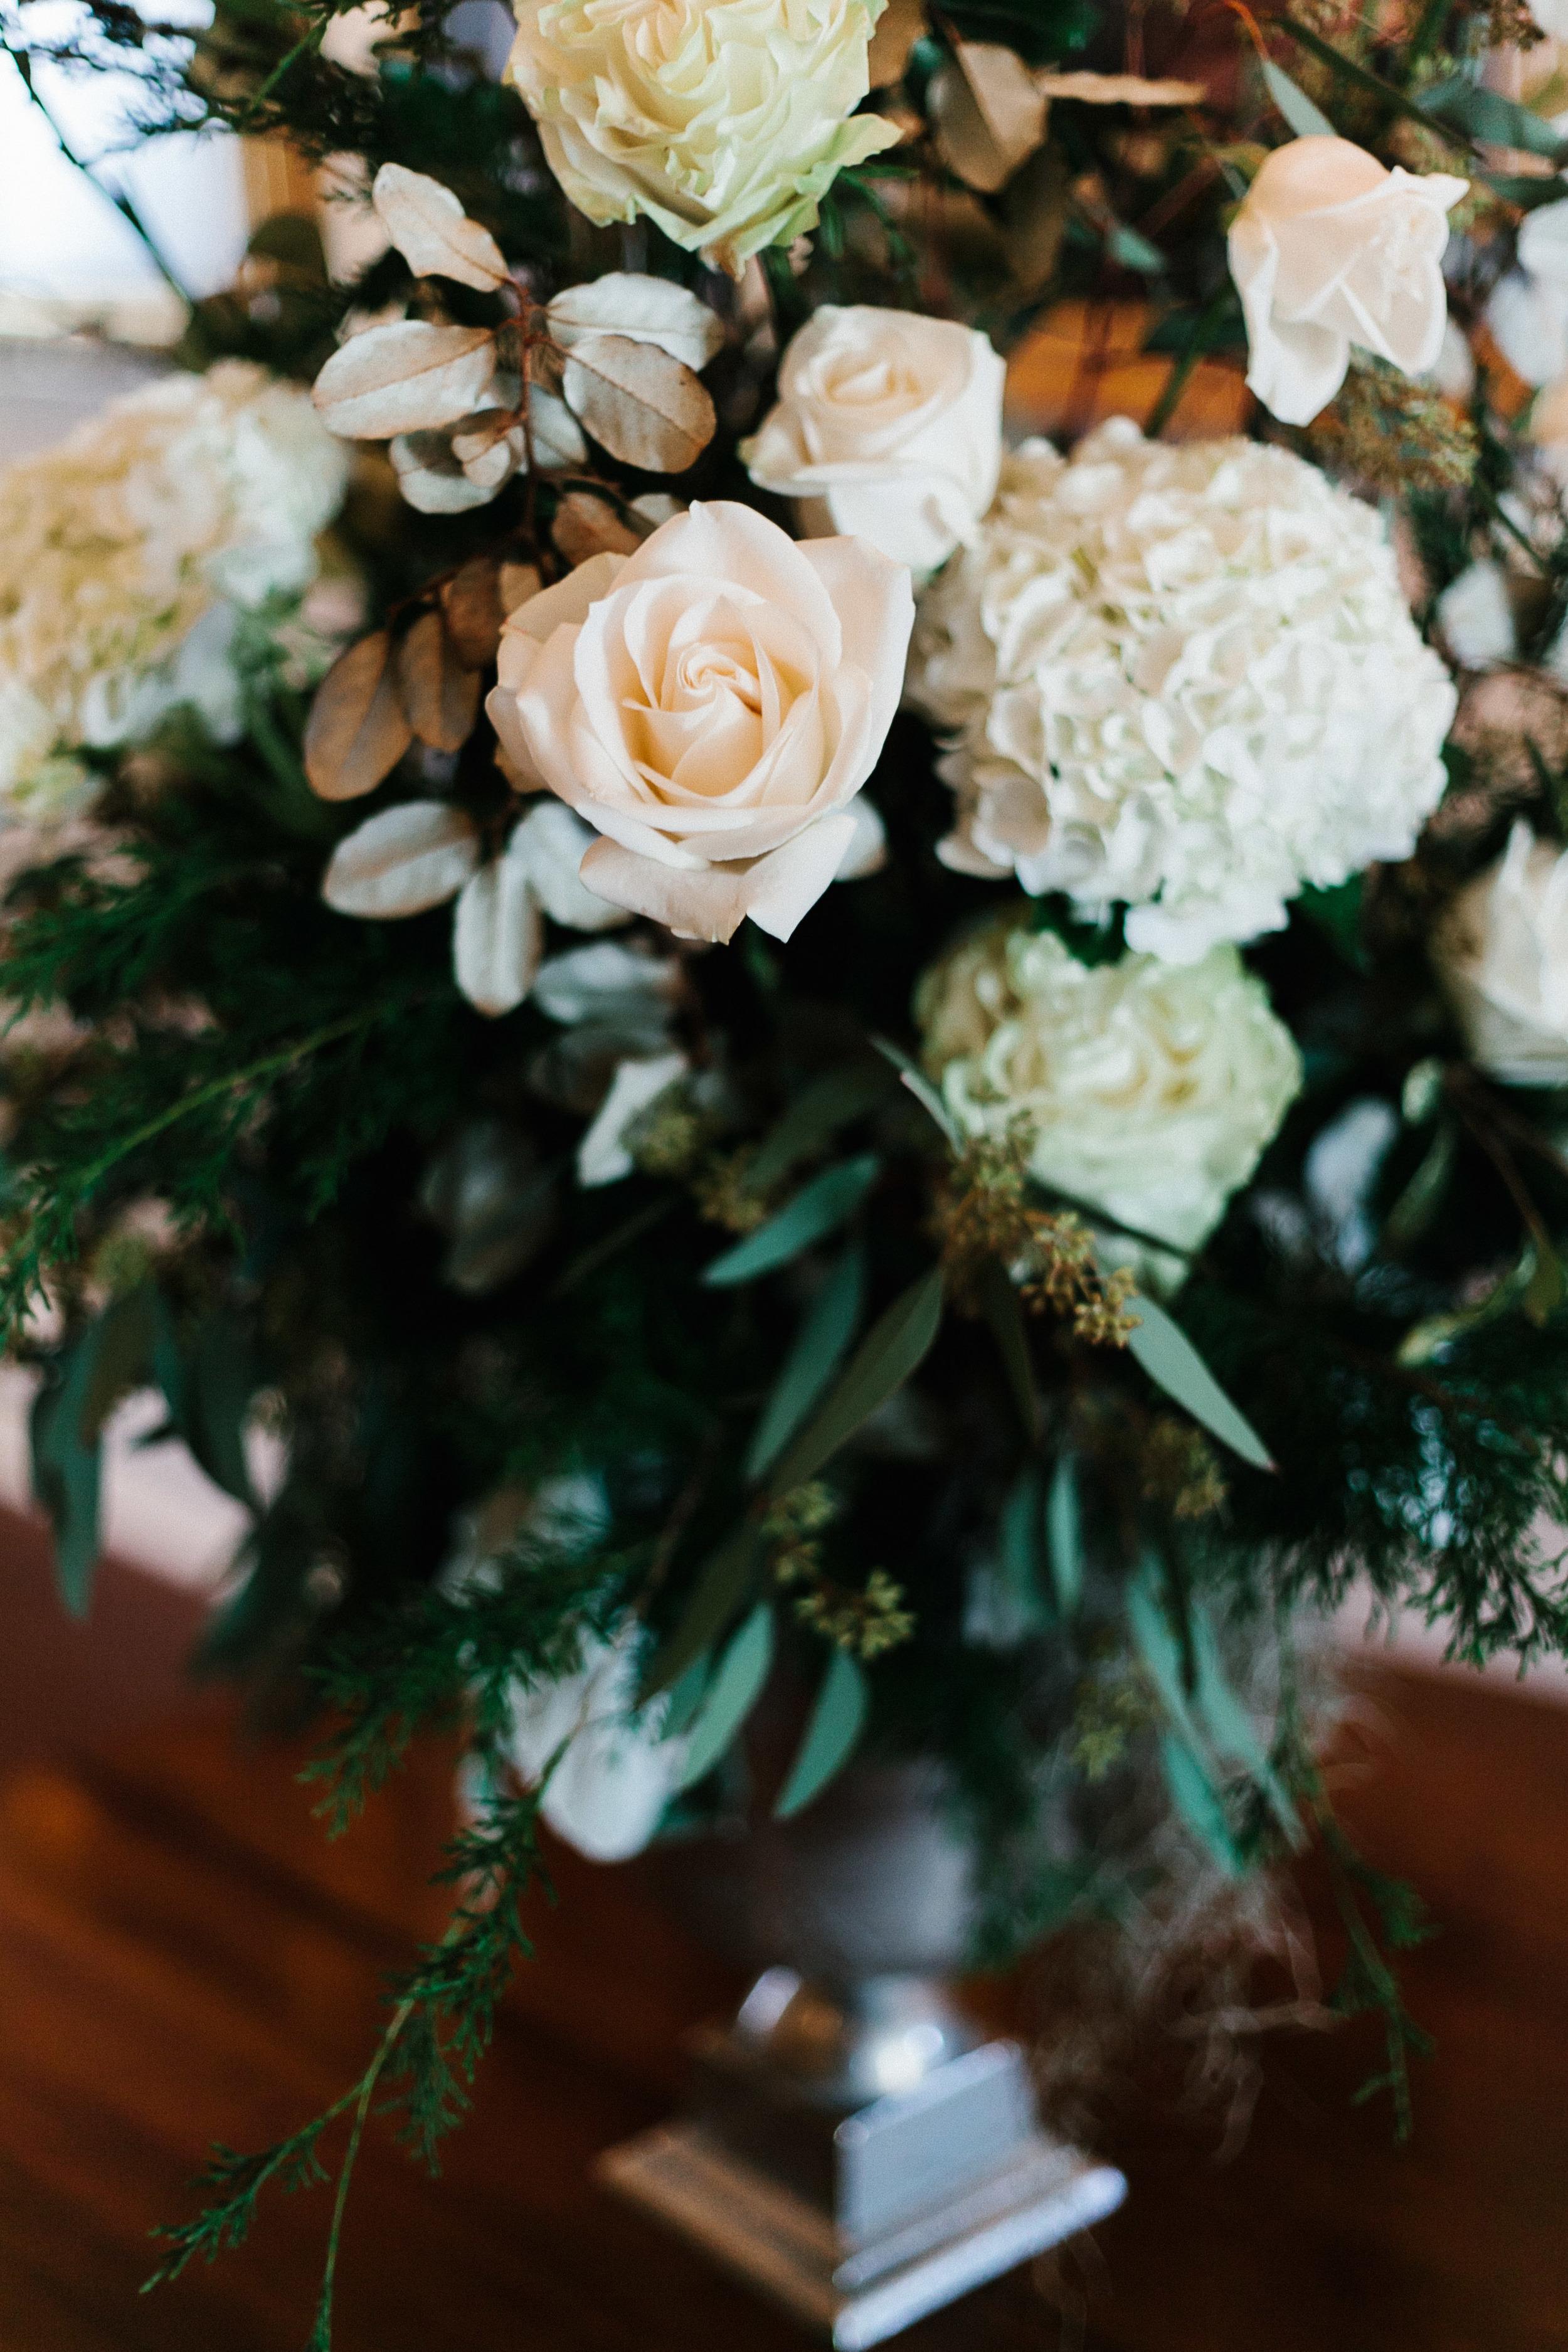 White rose and hydrangea centerpieces at winter wedding in Stillmore, GA by Mark Williams Studio